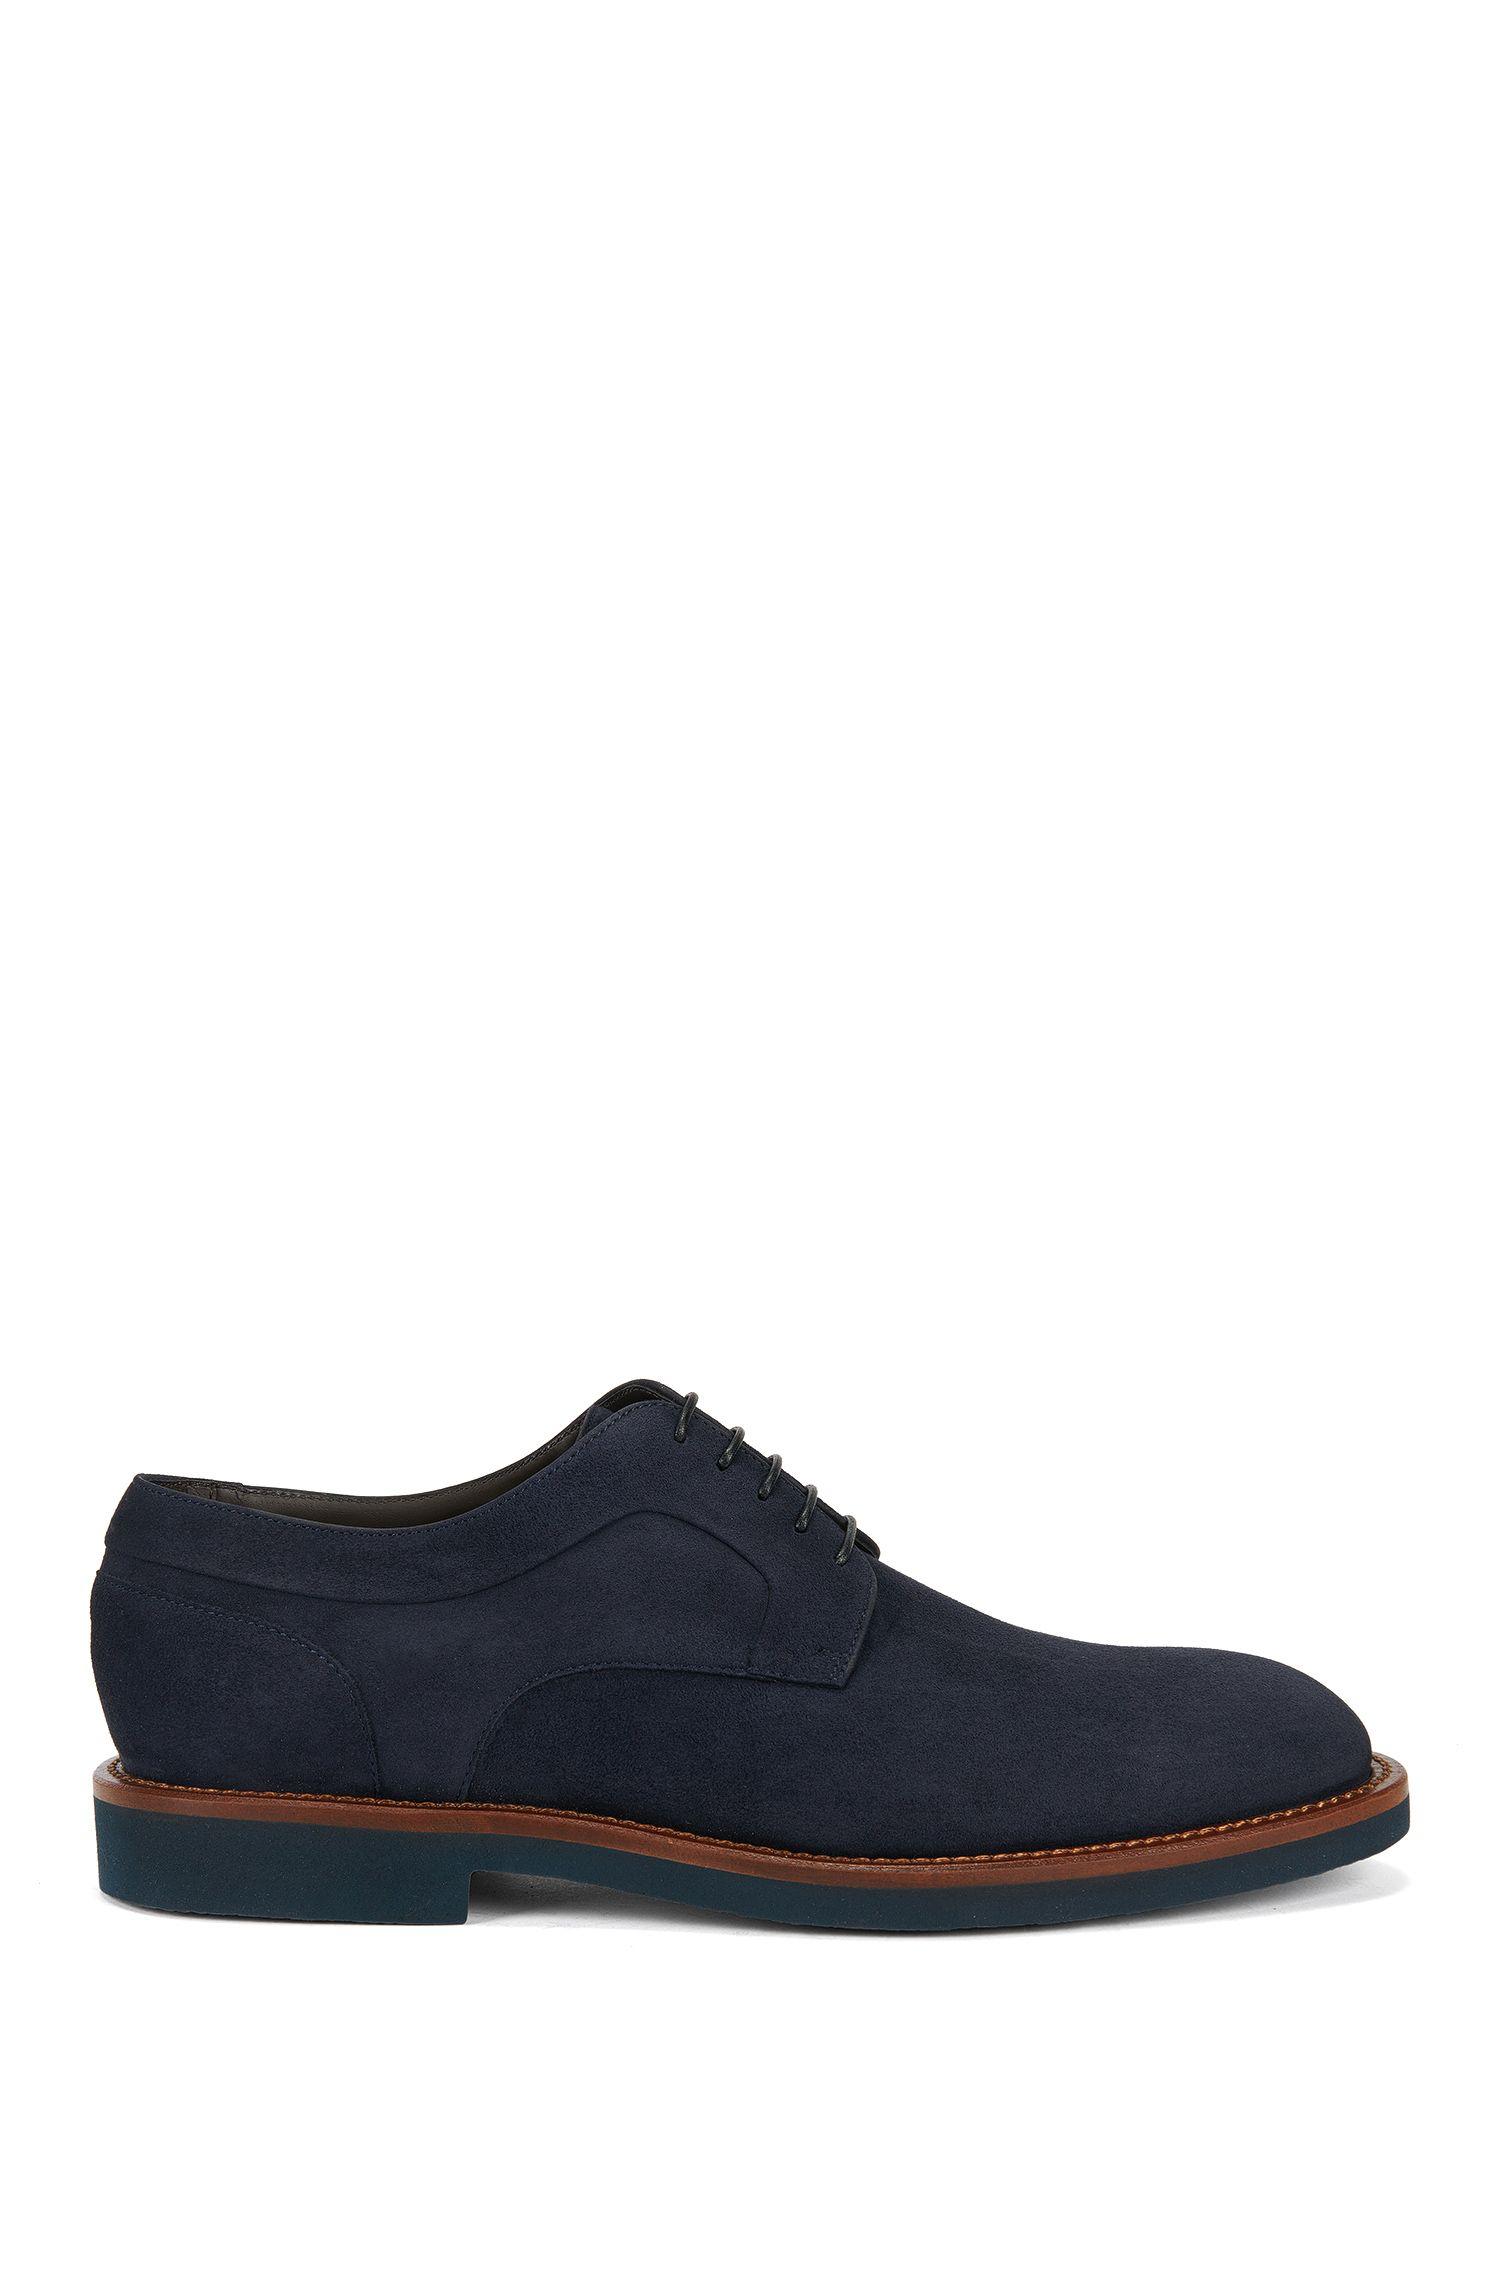 Nubuck Leather Derby Shoes   Eden Derb Sdg